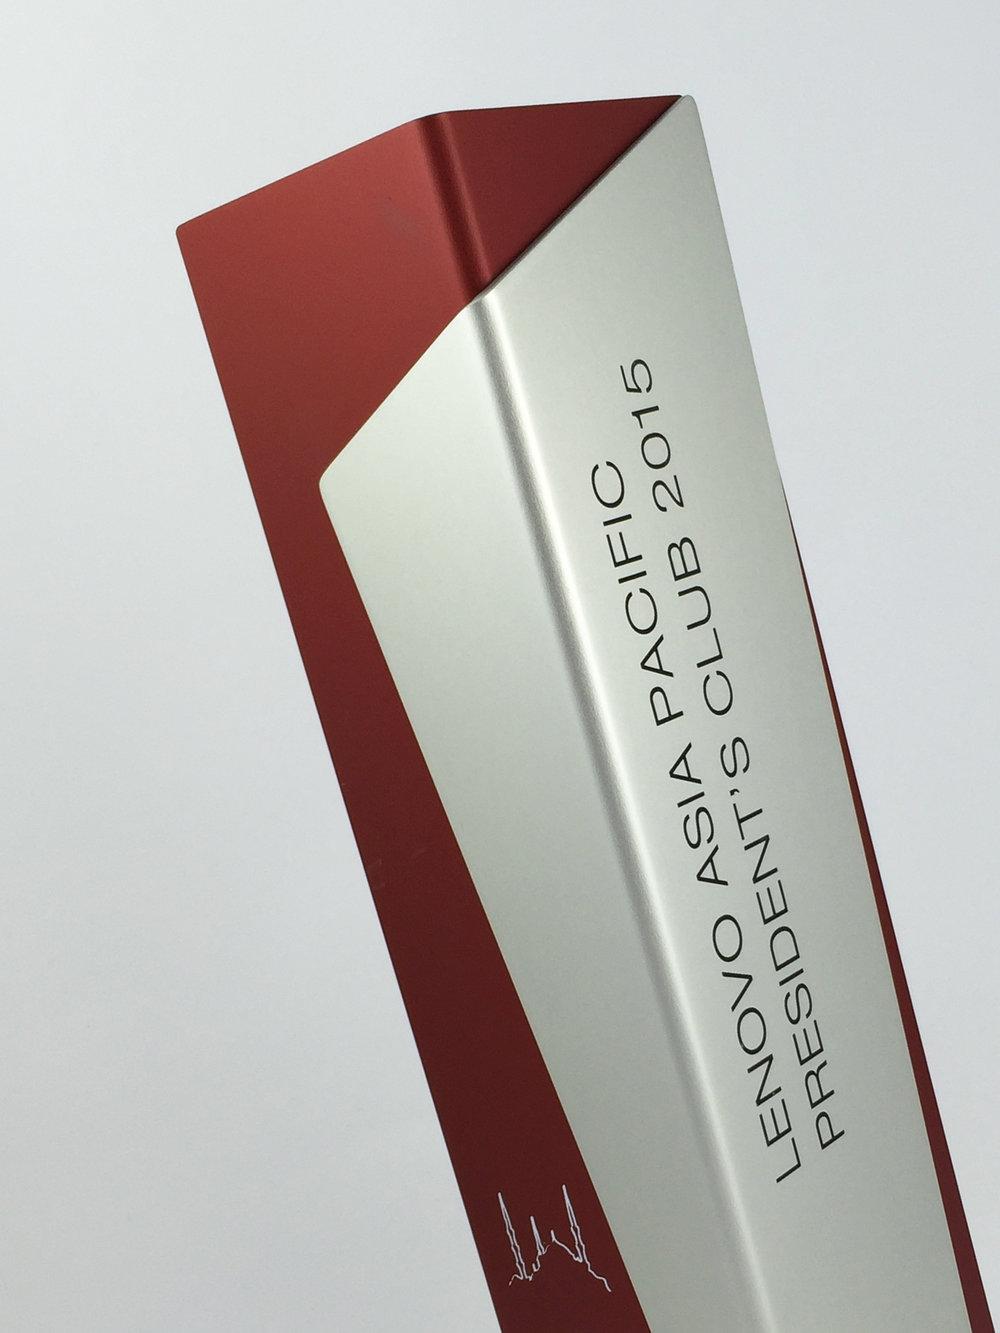 lenovo-presidents-club-aluminium-trophy-awards-03.jpg